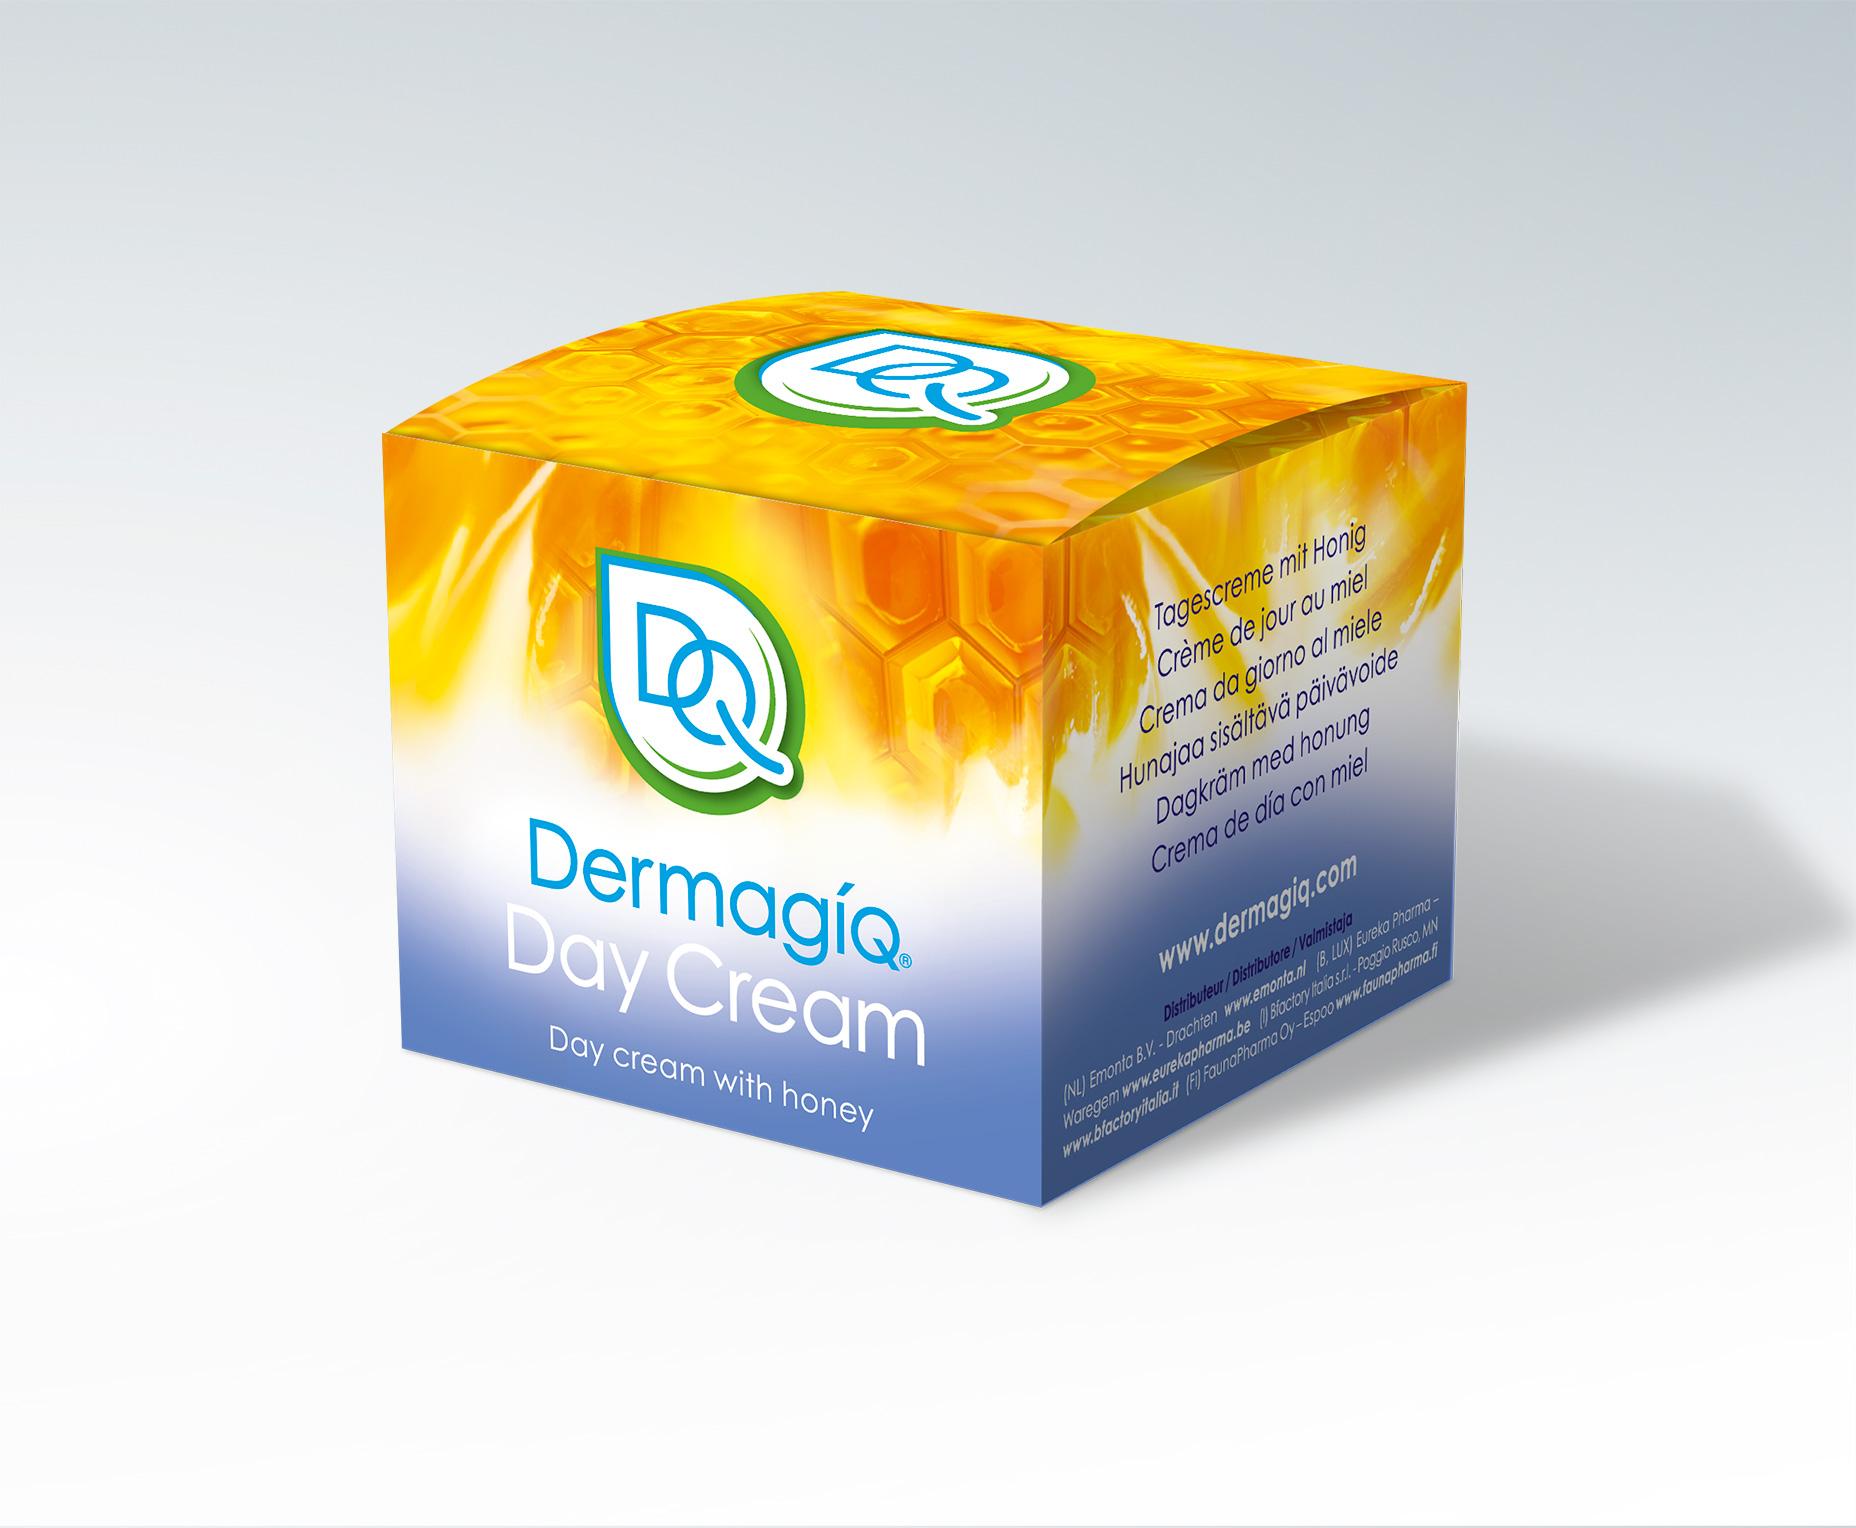 Dermagiq Day Cream